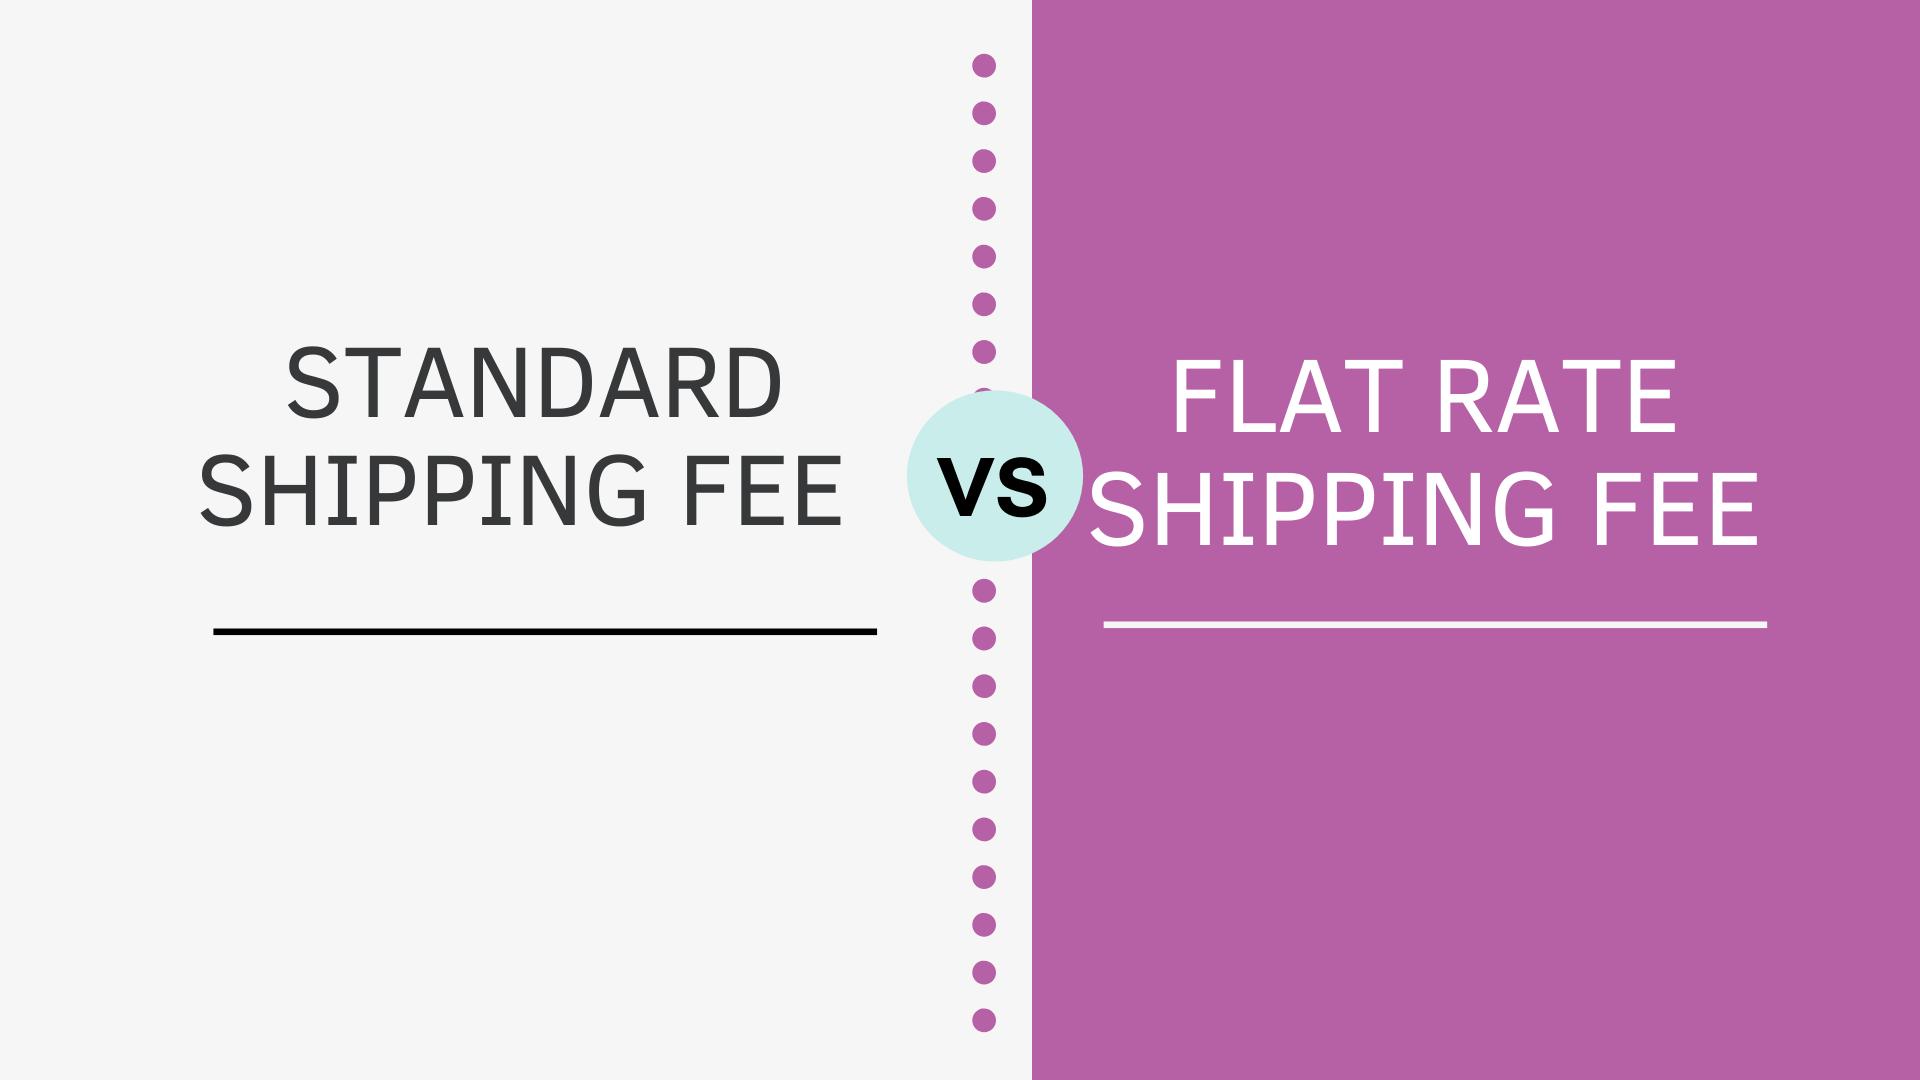 Standard Vs Flat Rate Shipping Fee in WooCommerce